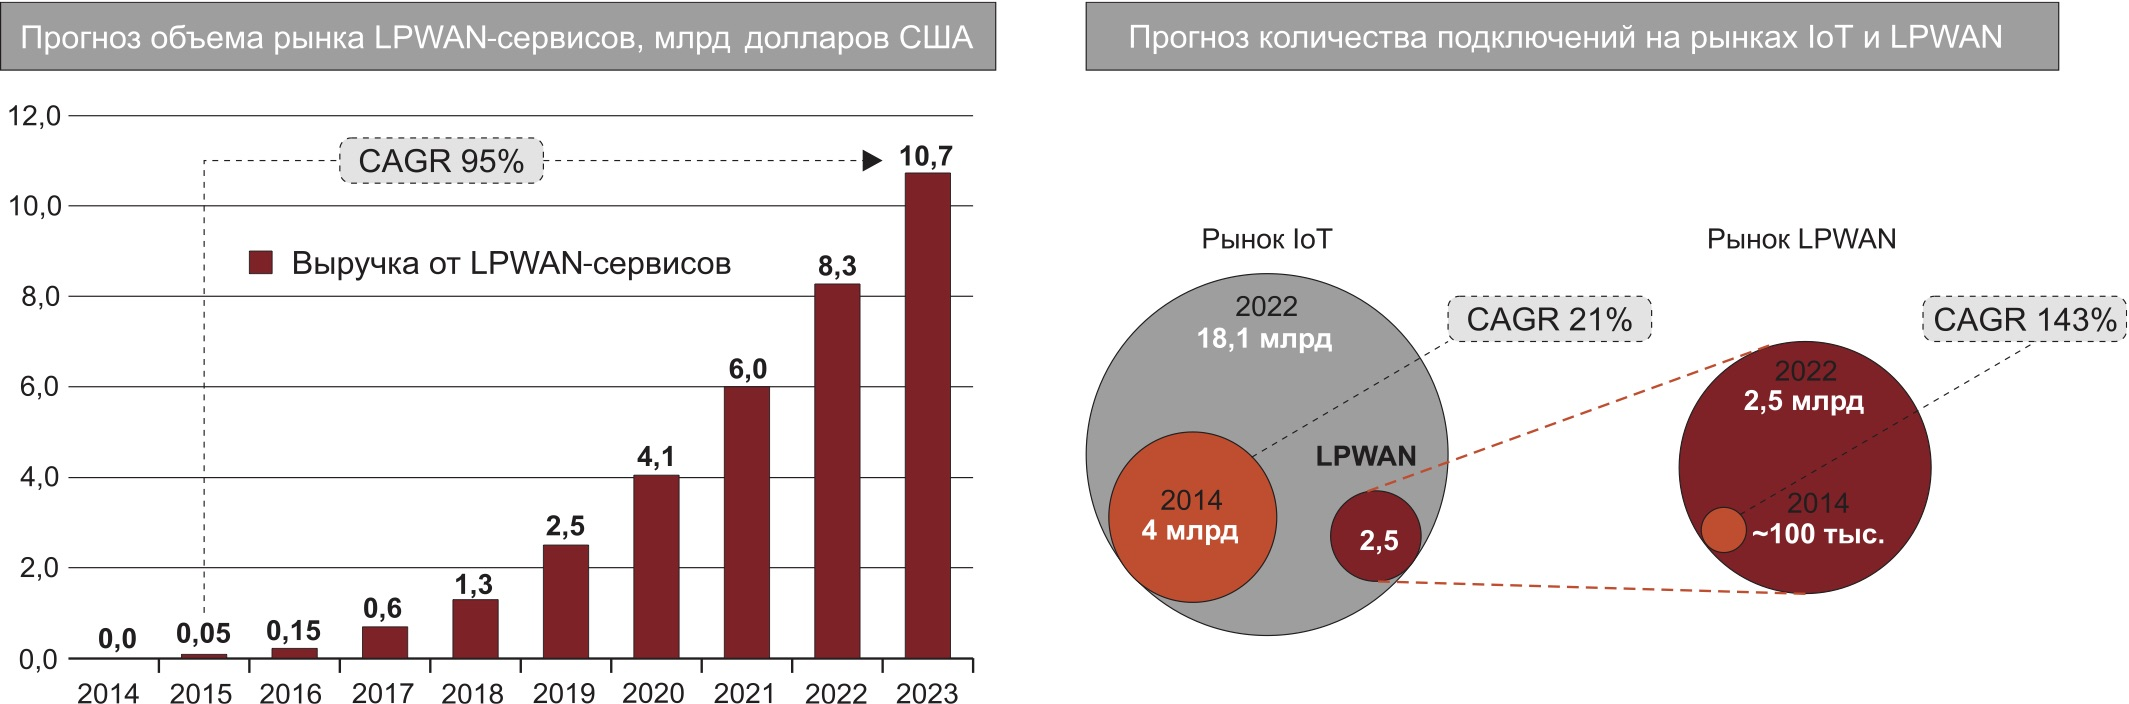 Прогноз развития рынков IoT и LPWAN (источники: Analysys Mason, Machina Research)